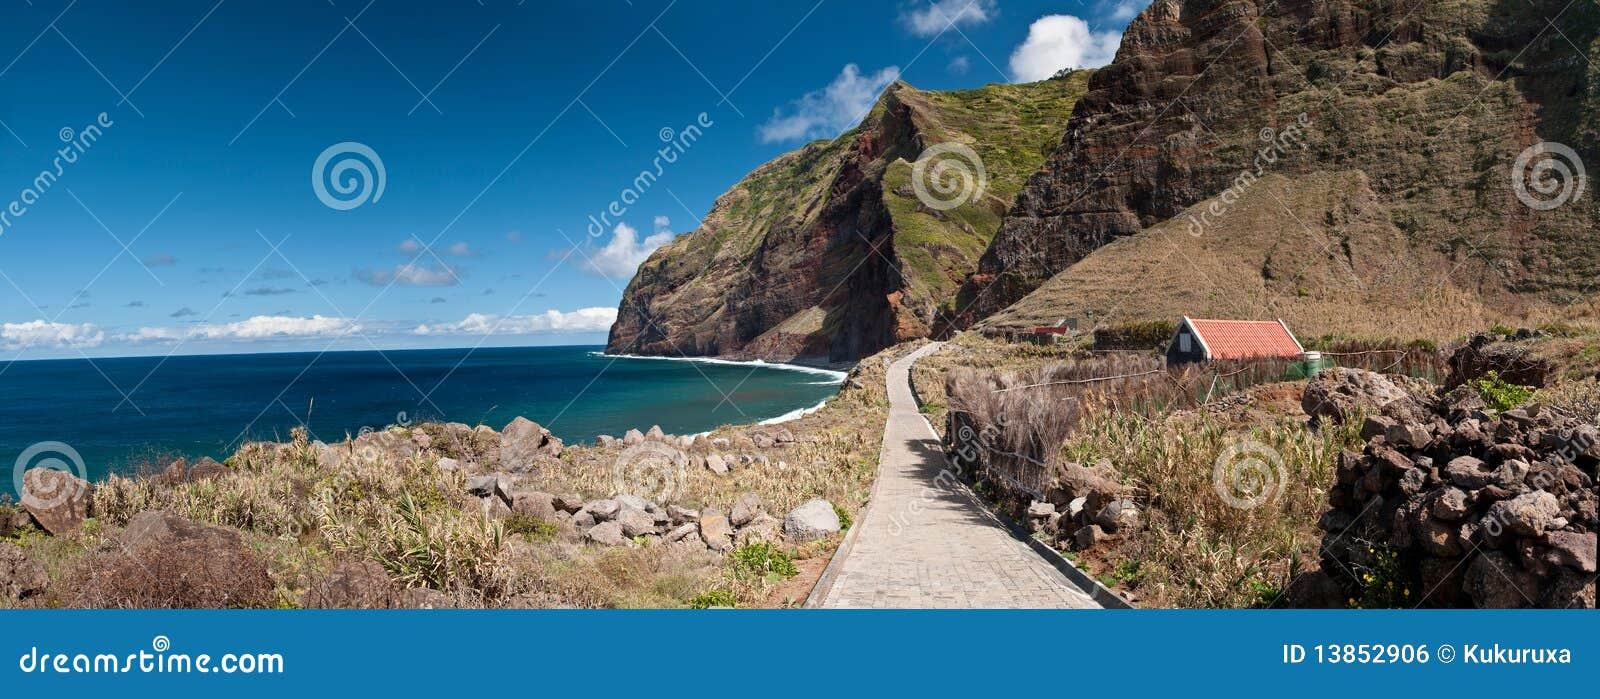 Cliffs surround a bay on Madeira